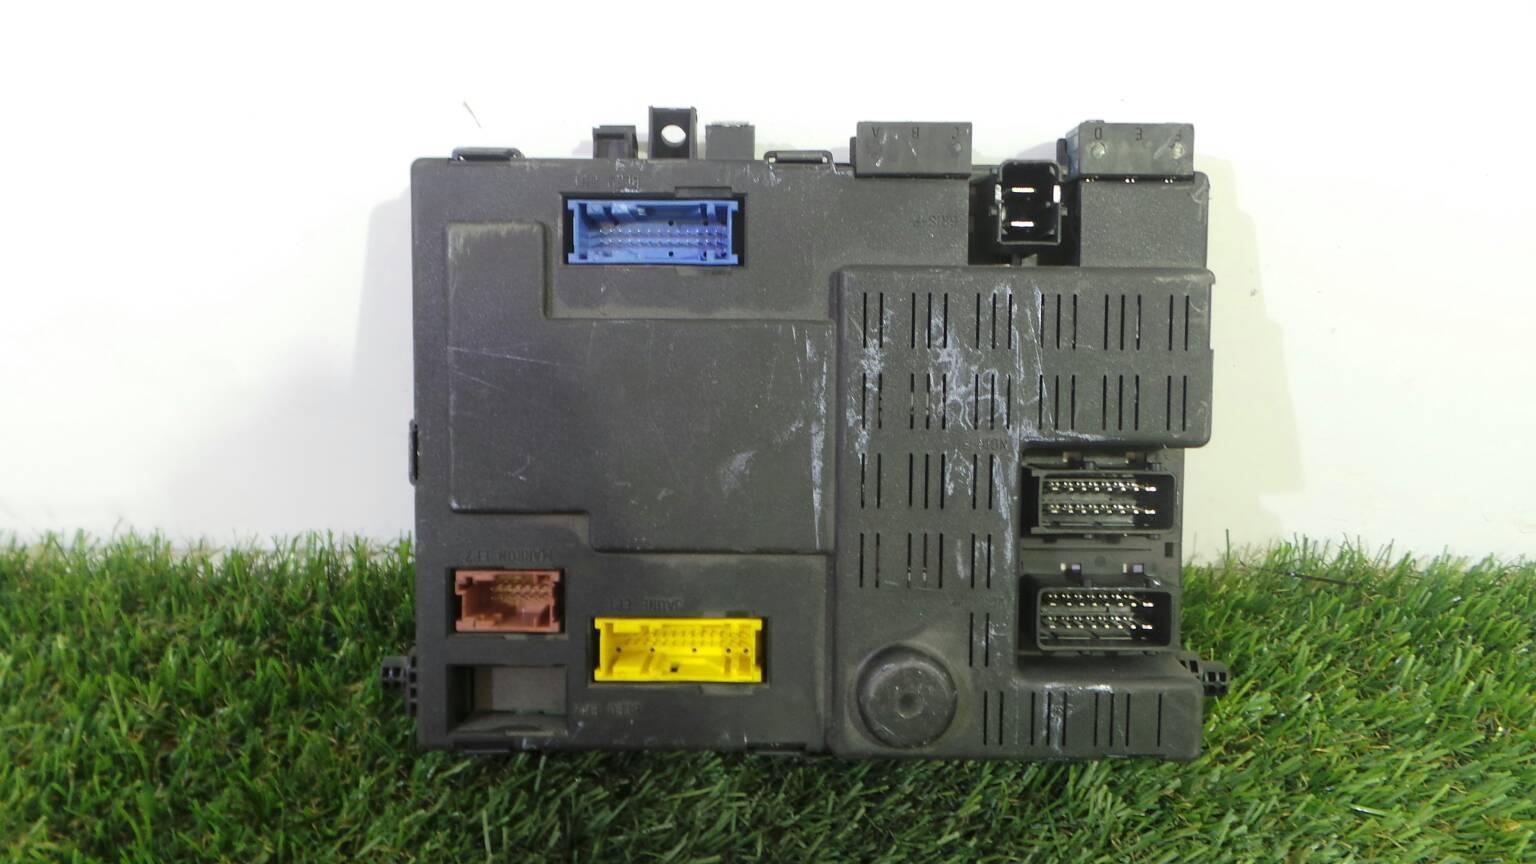 hight resolution of fuse box 96 424 094 80 citro n xsara n1 2 0 hdi 90